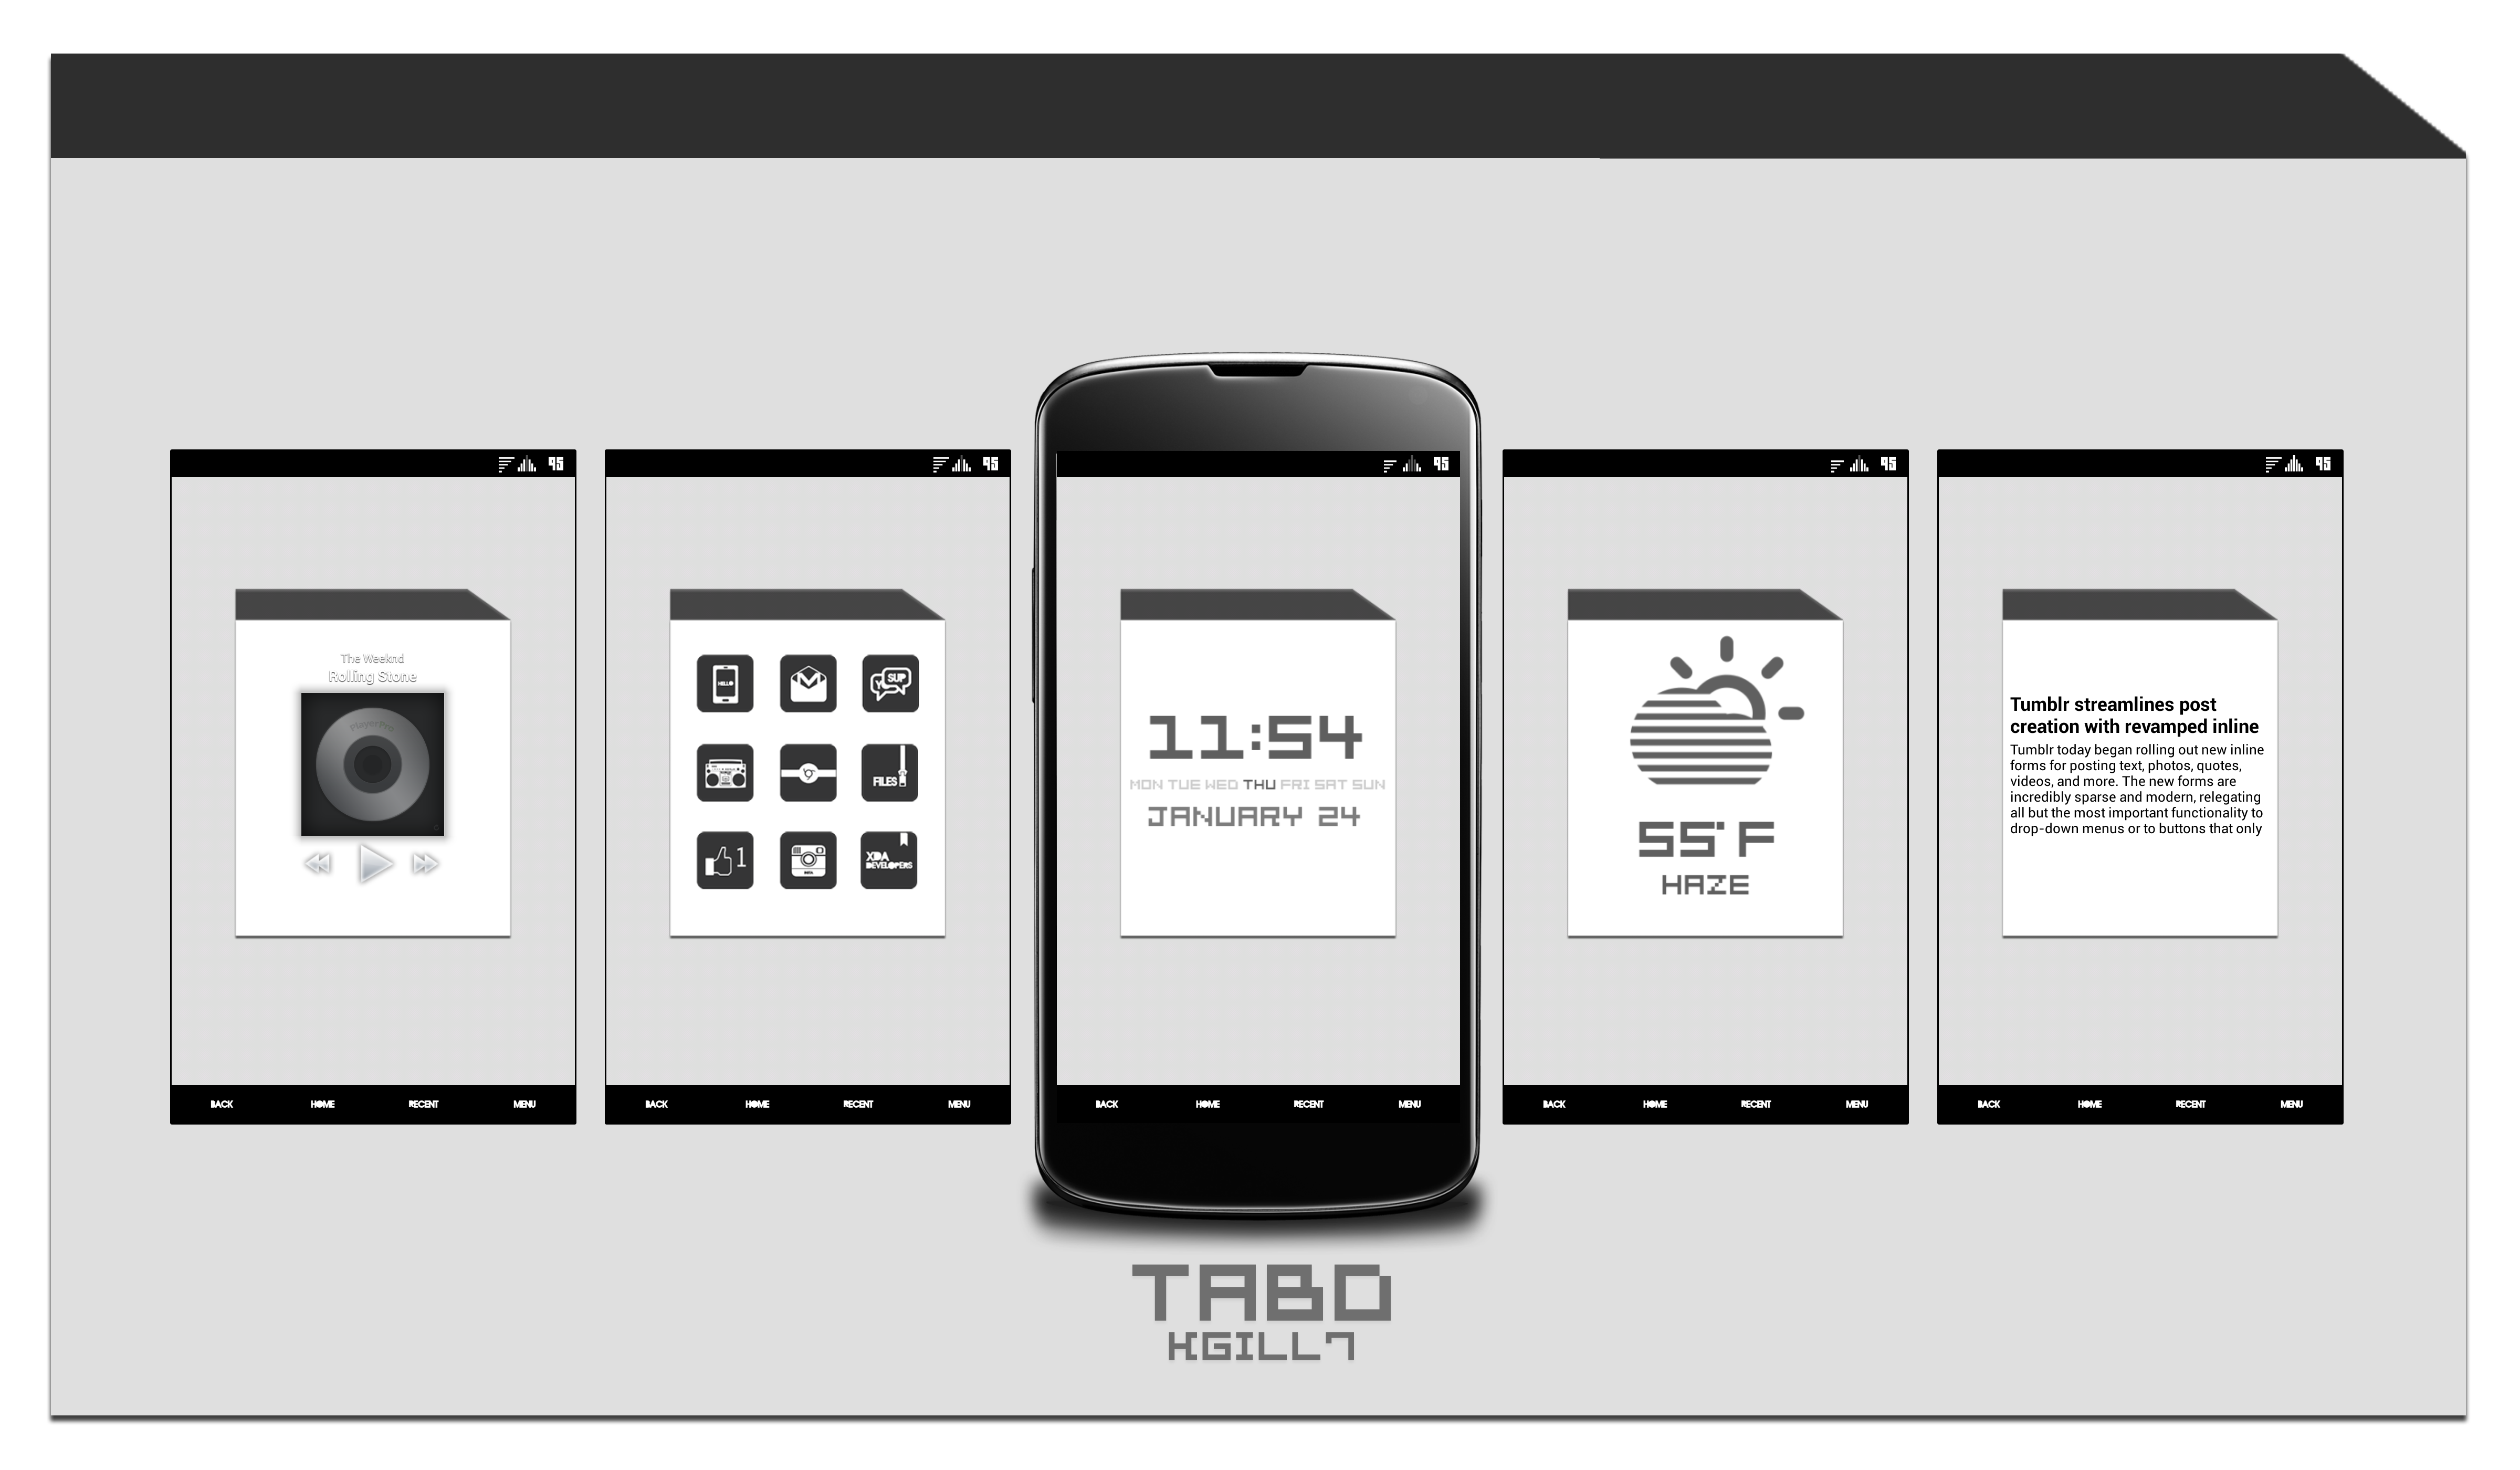 TABD. by kgill77